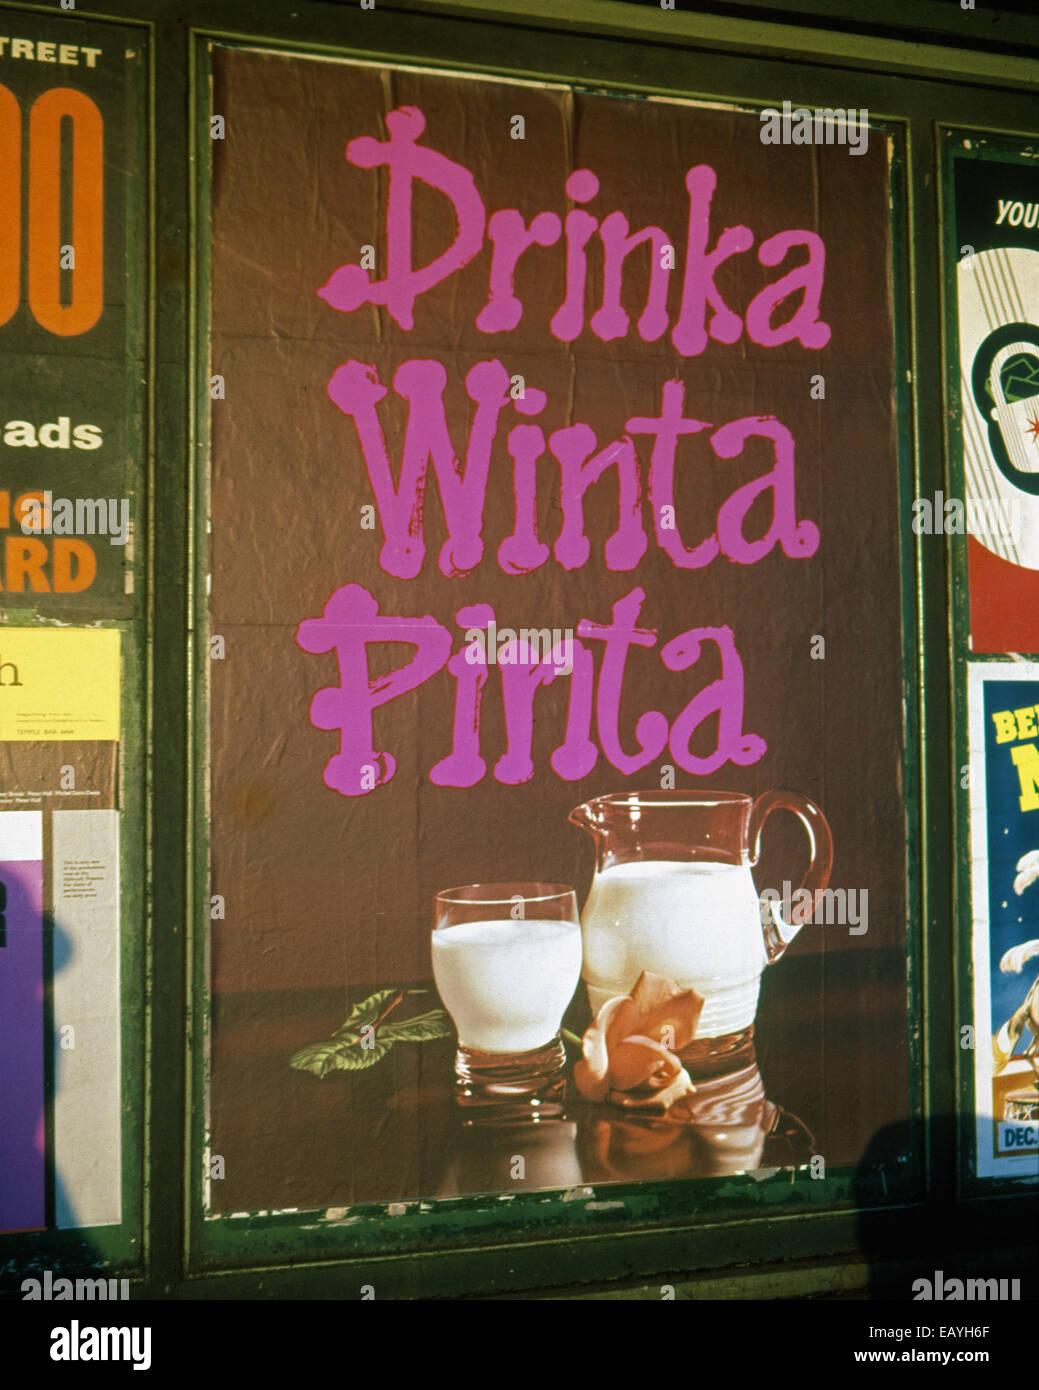 Drinka Pinta Milka Day Stock Photos Drinka Pinta Milka Day Stock